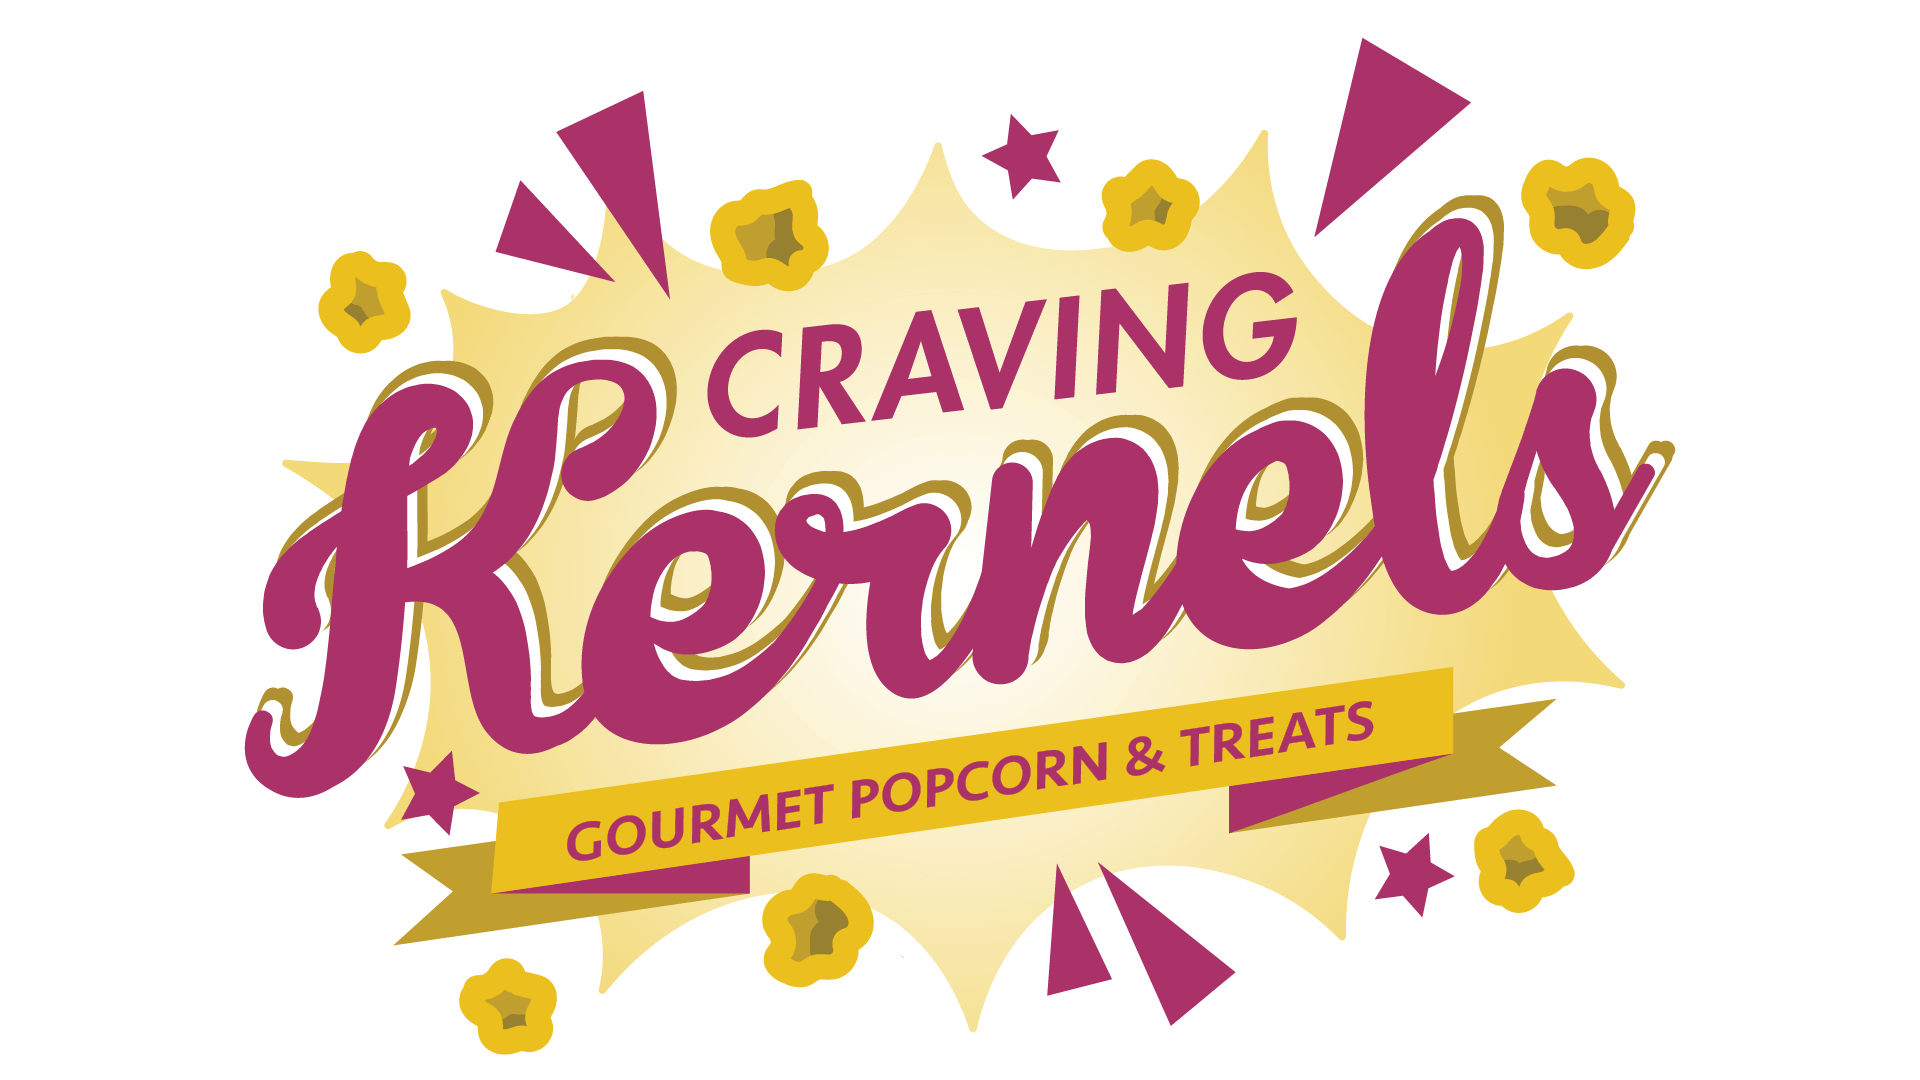 Craving Kernels Gourmet Popcorn and Treats